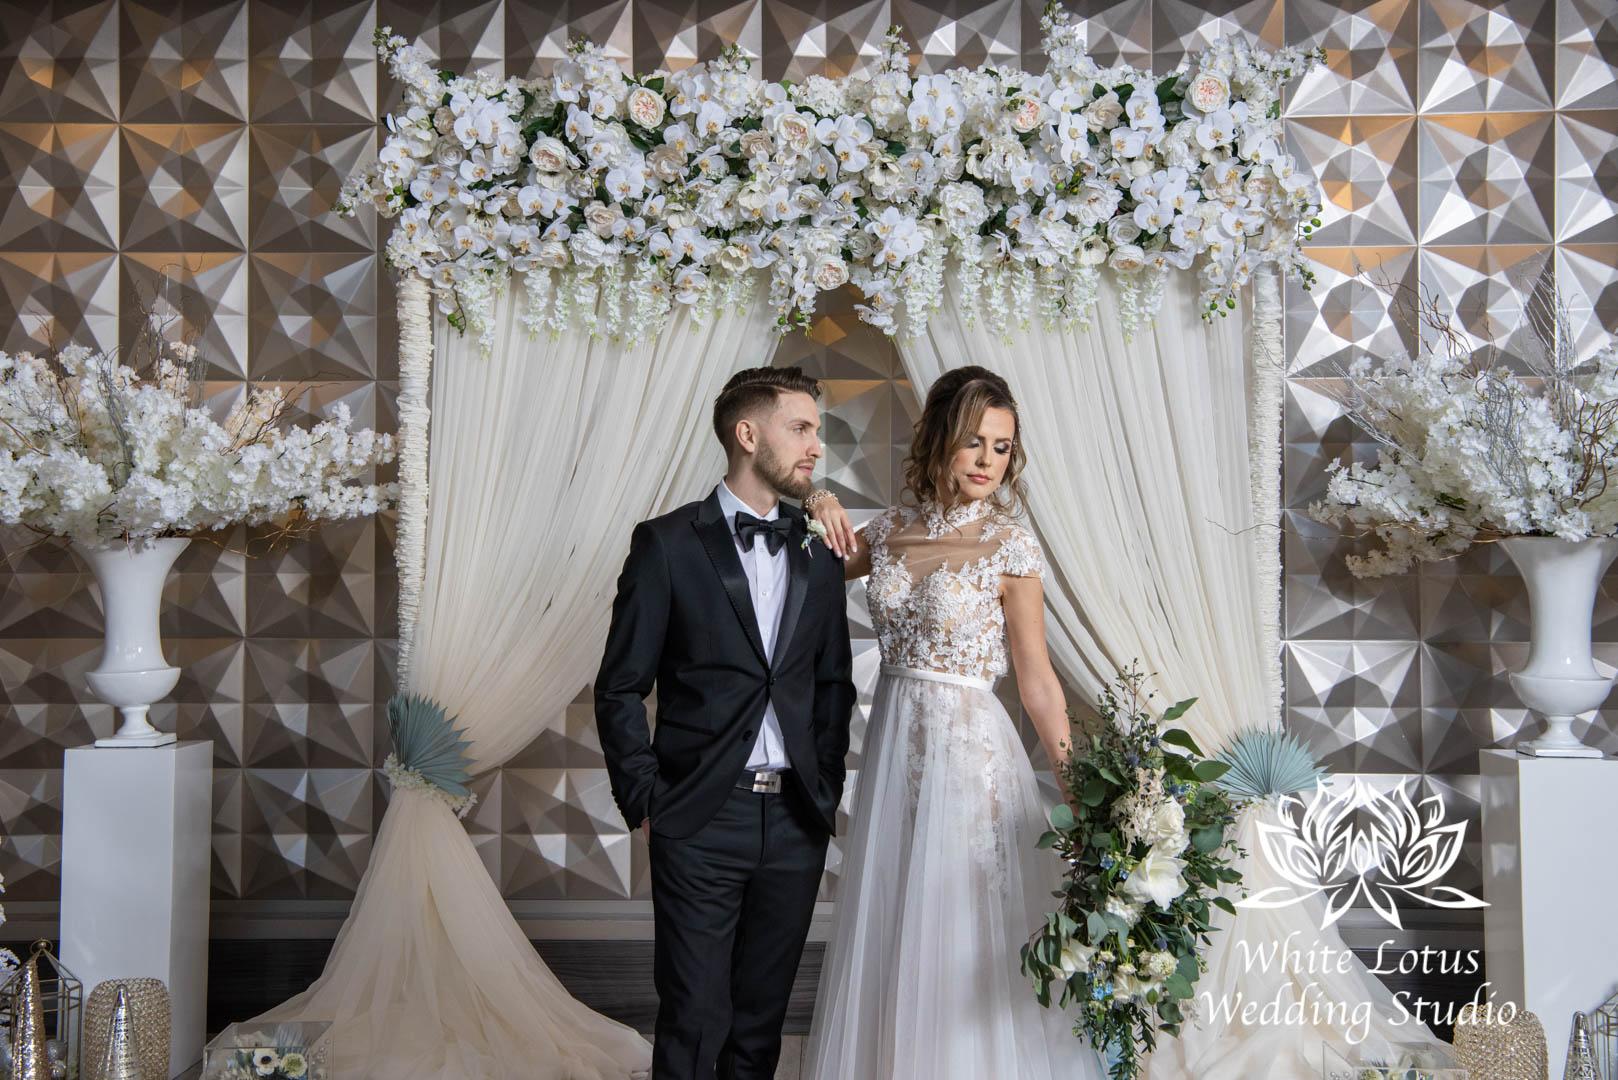 044- GLAM WINTERLUXE WEDDING INSPIRATION